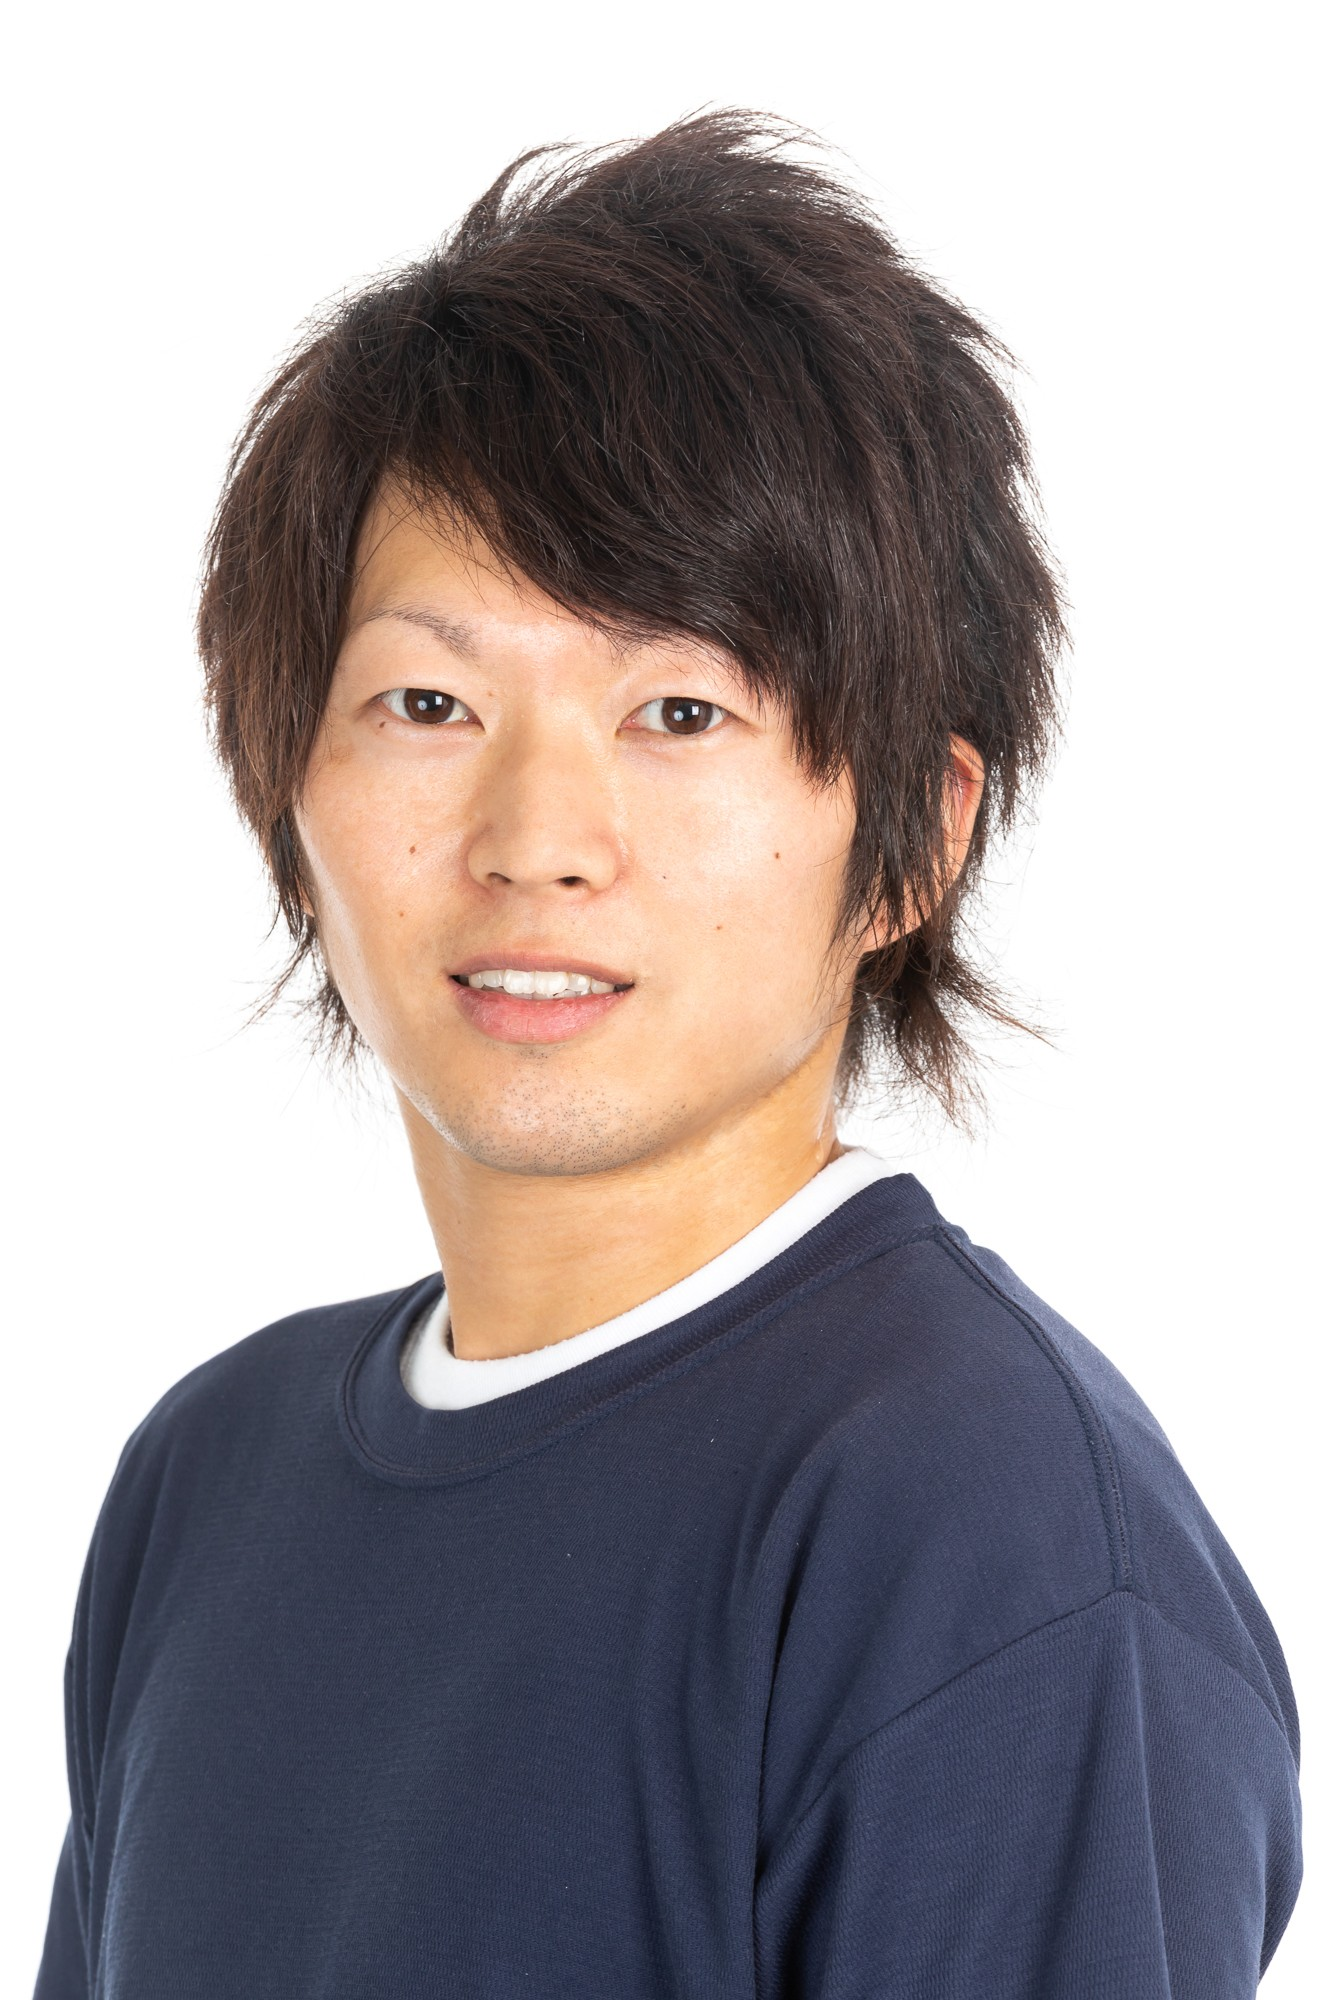 佐藤瞬,ShunSato